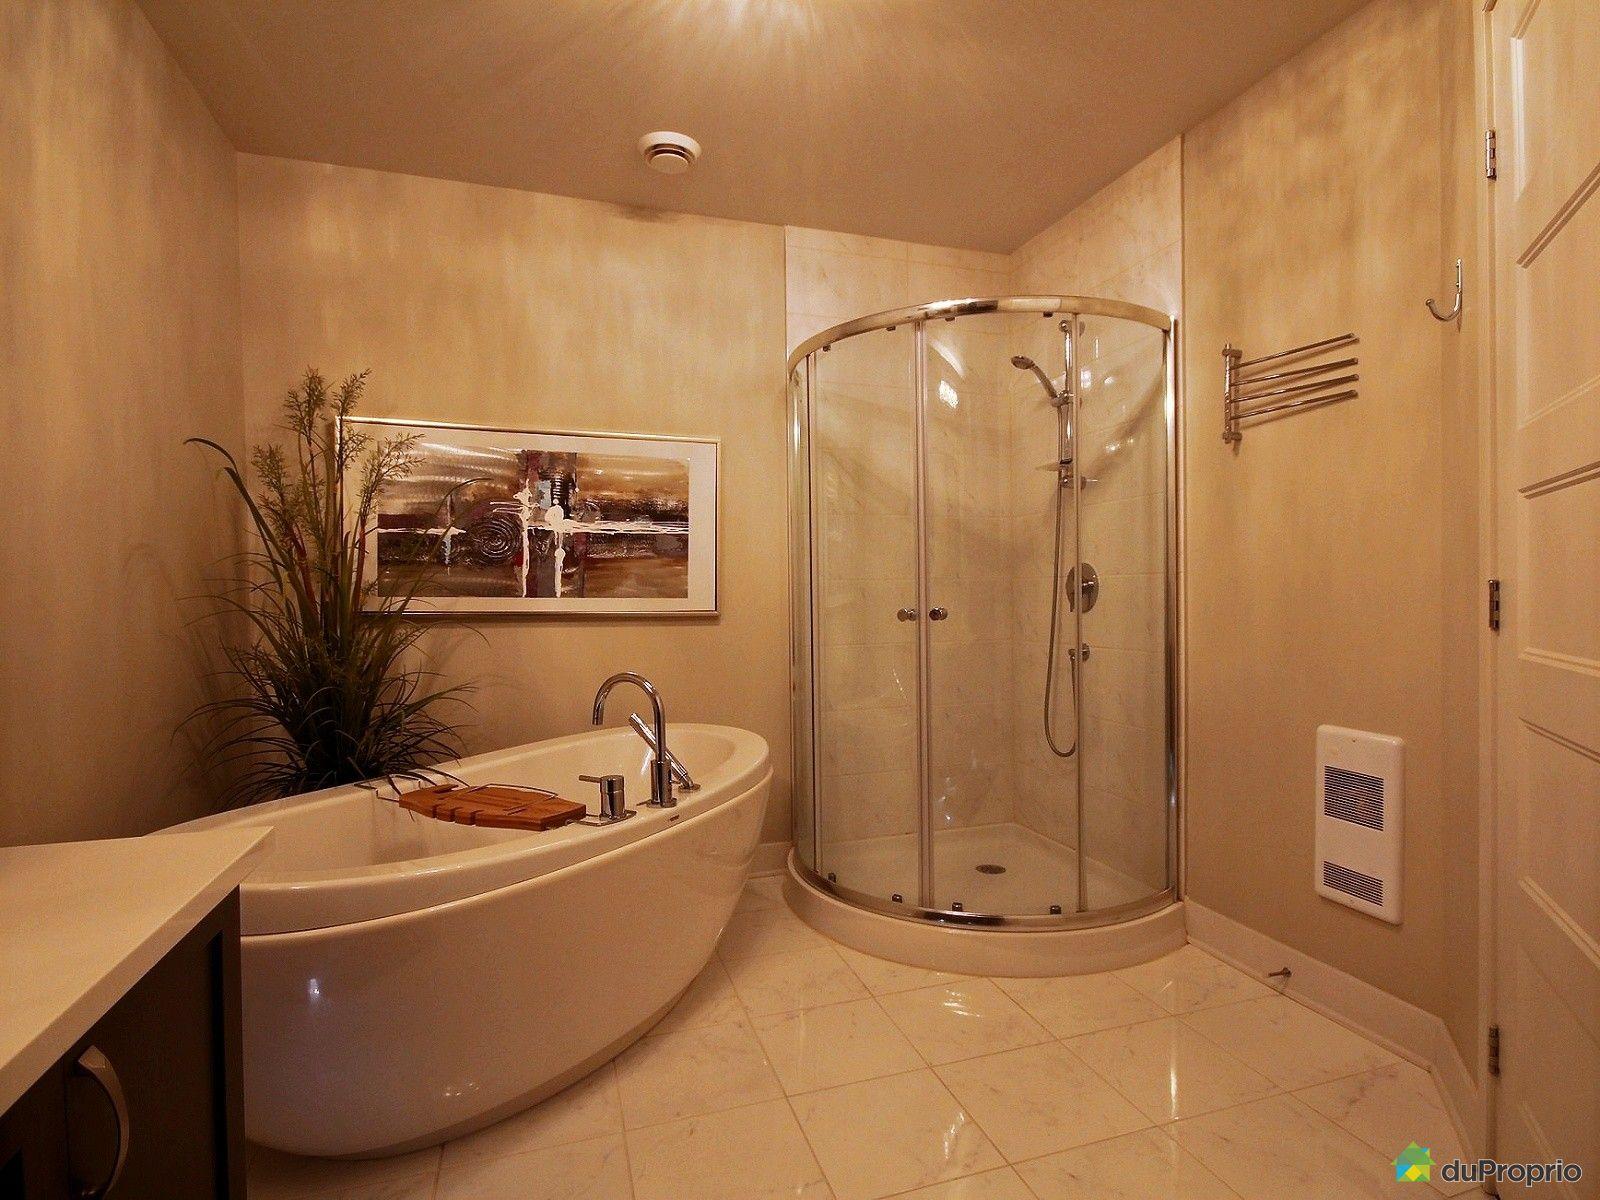 Condo vendre st j r me 201 260 rue radisson immobilier for Accessoire salle de bain st jerome